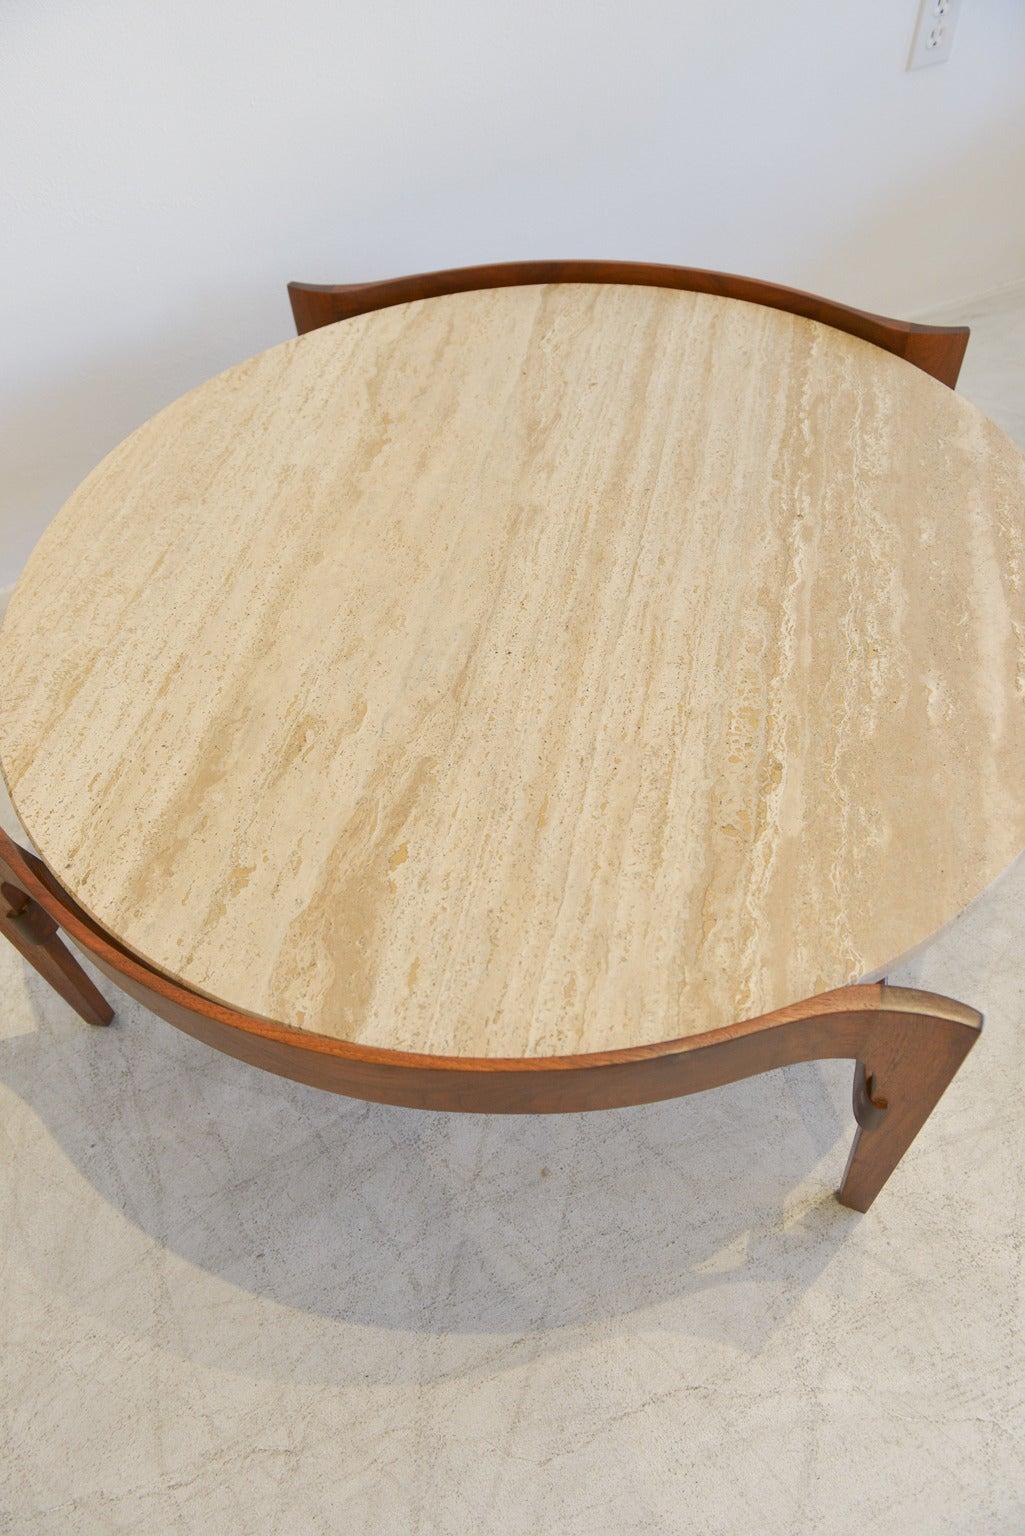 Mid-Century Modern Travertine and Sculptural Walnut Coffee Table